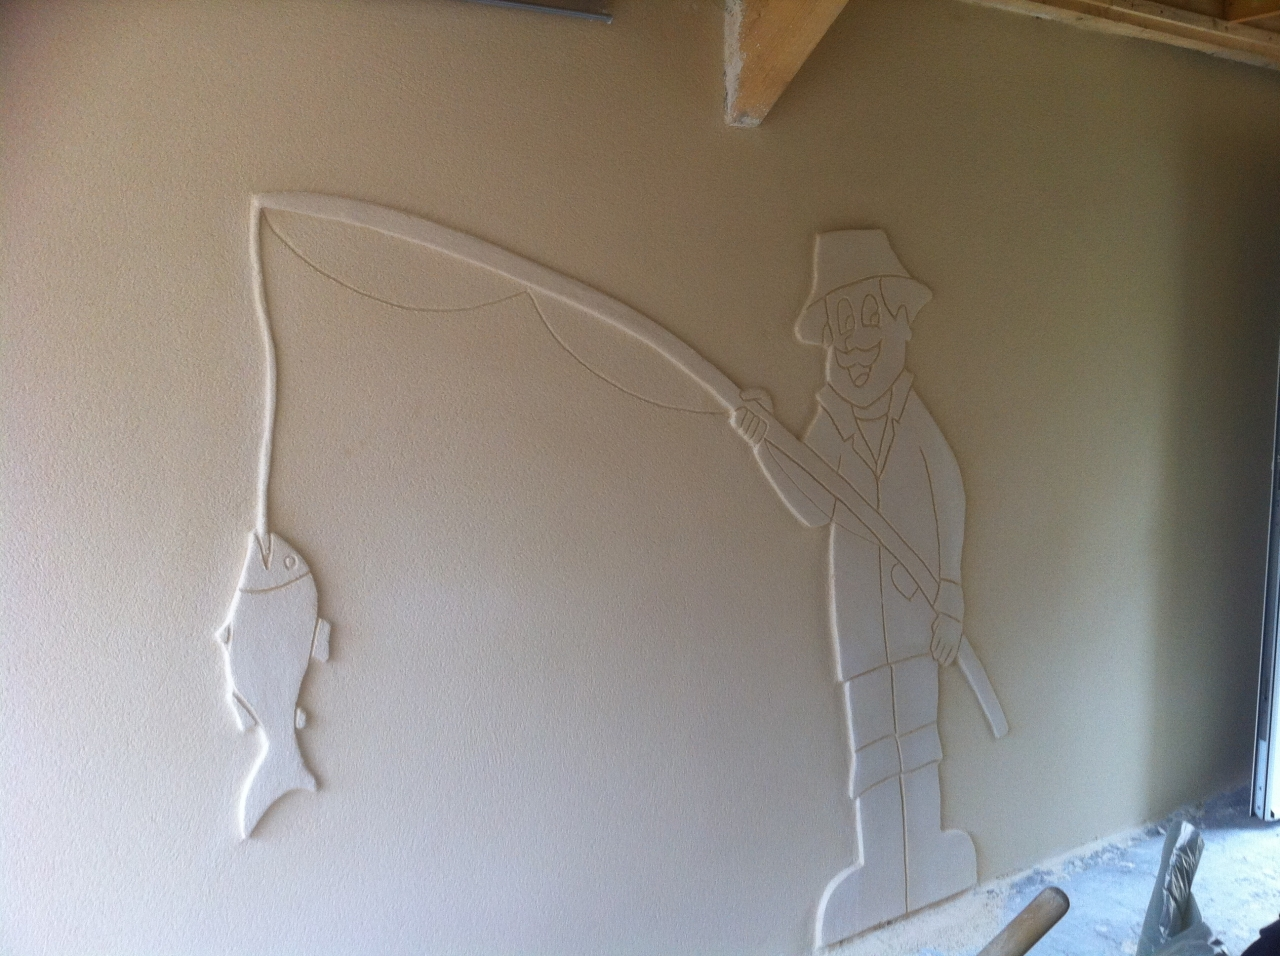 Artisan Maçon maçonnerie à Mareil-Marly 78750